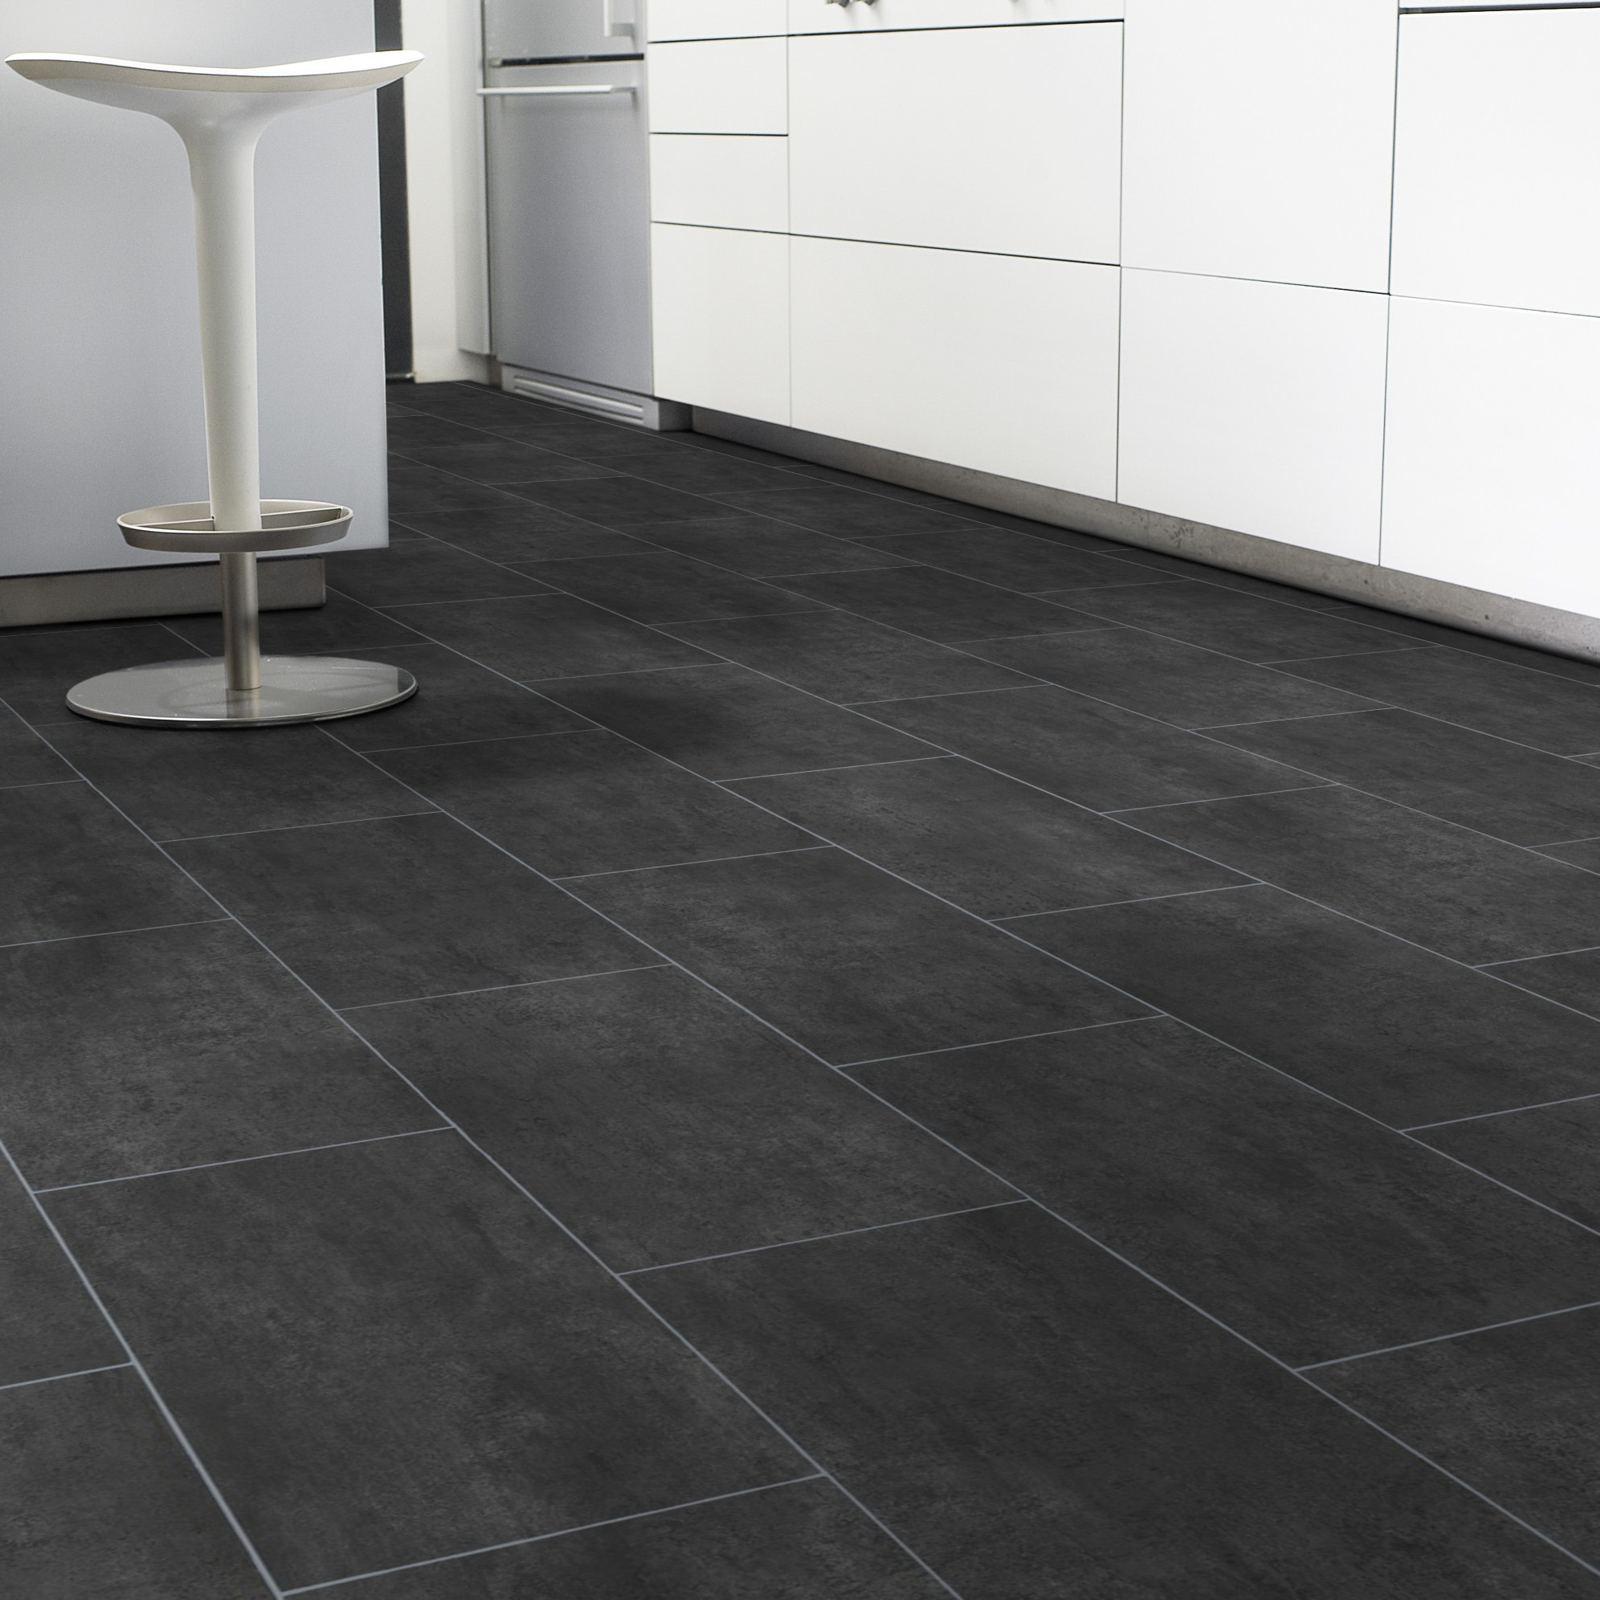 pvc bodenbelag fliese schwarz melbourne noir fliese stein pvc cv bel ge design pvc vinyl. Black Bedroom Furniture Sets. Home Design Ideas